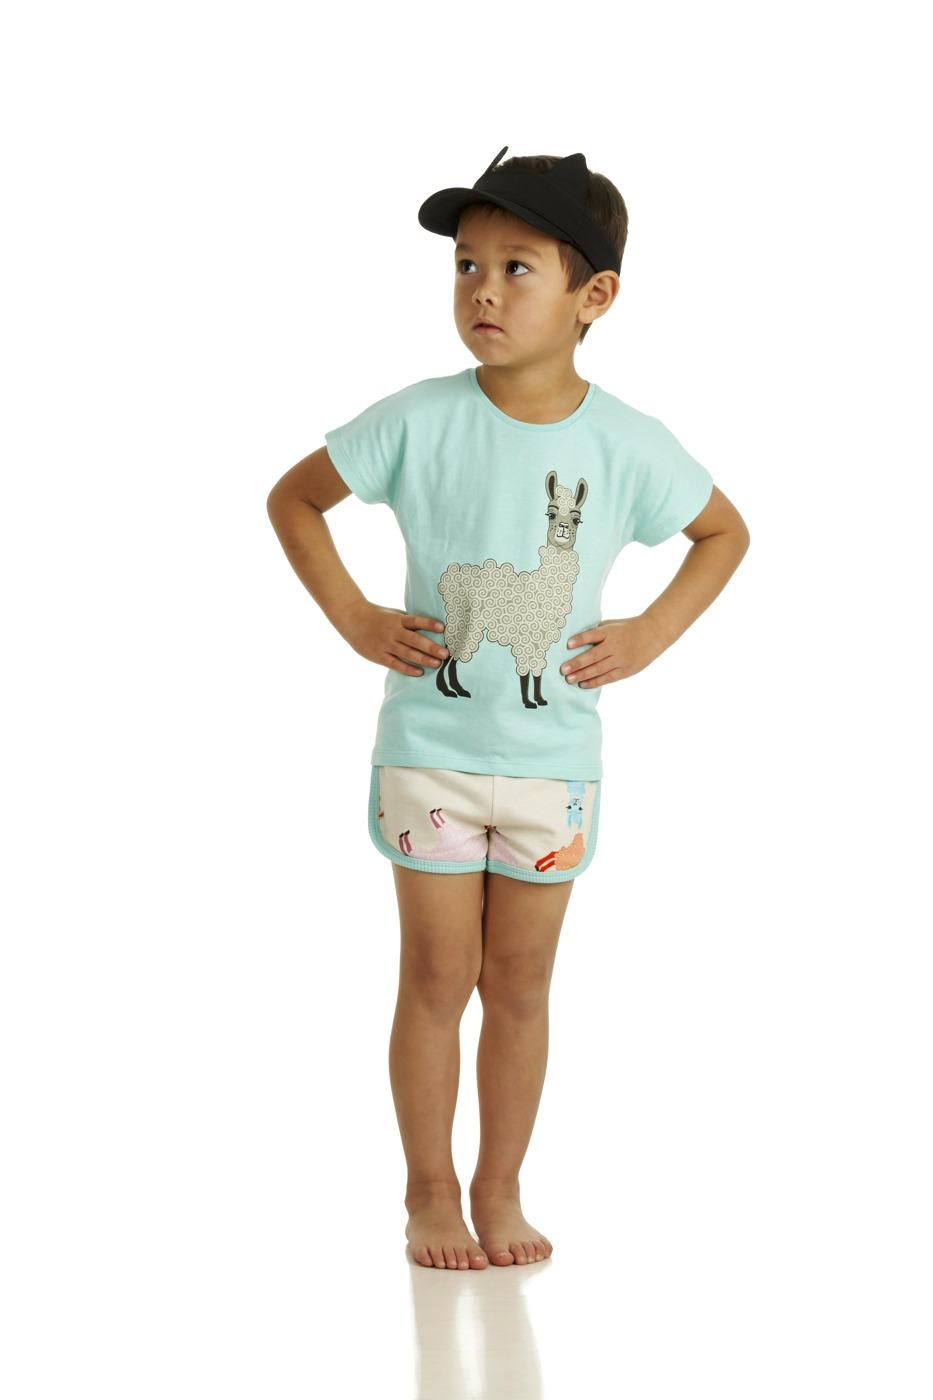 17SSTA T-shirt Alpaca 17SSSHA Shorts Alpaca B